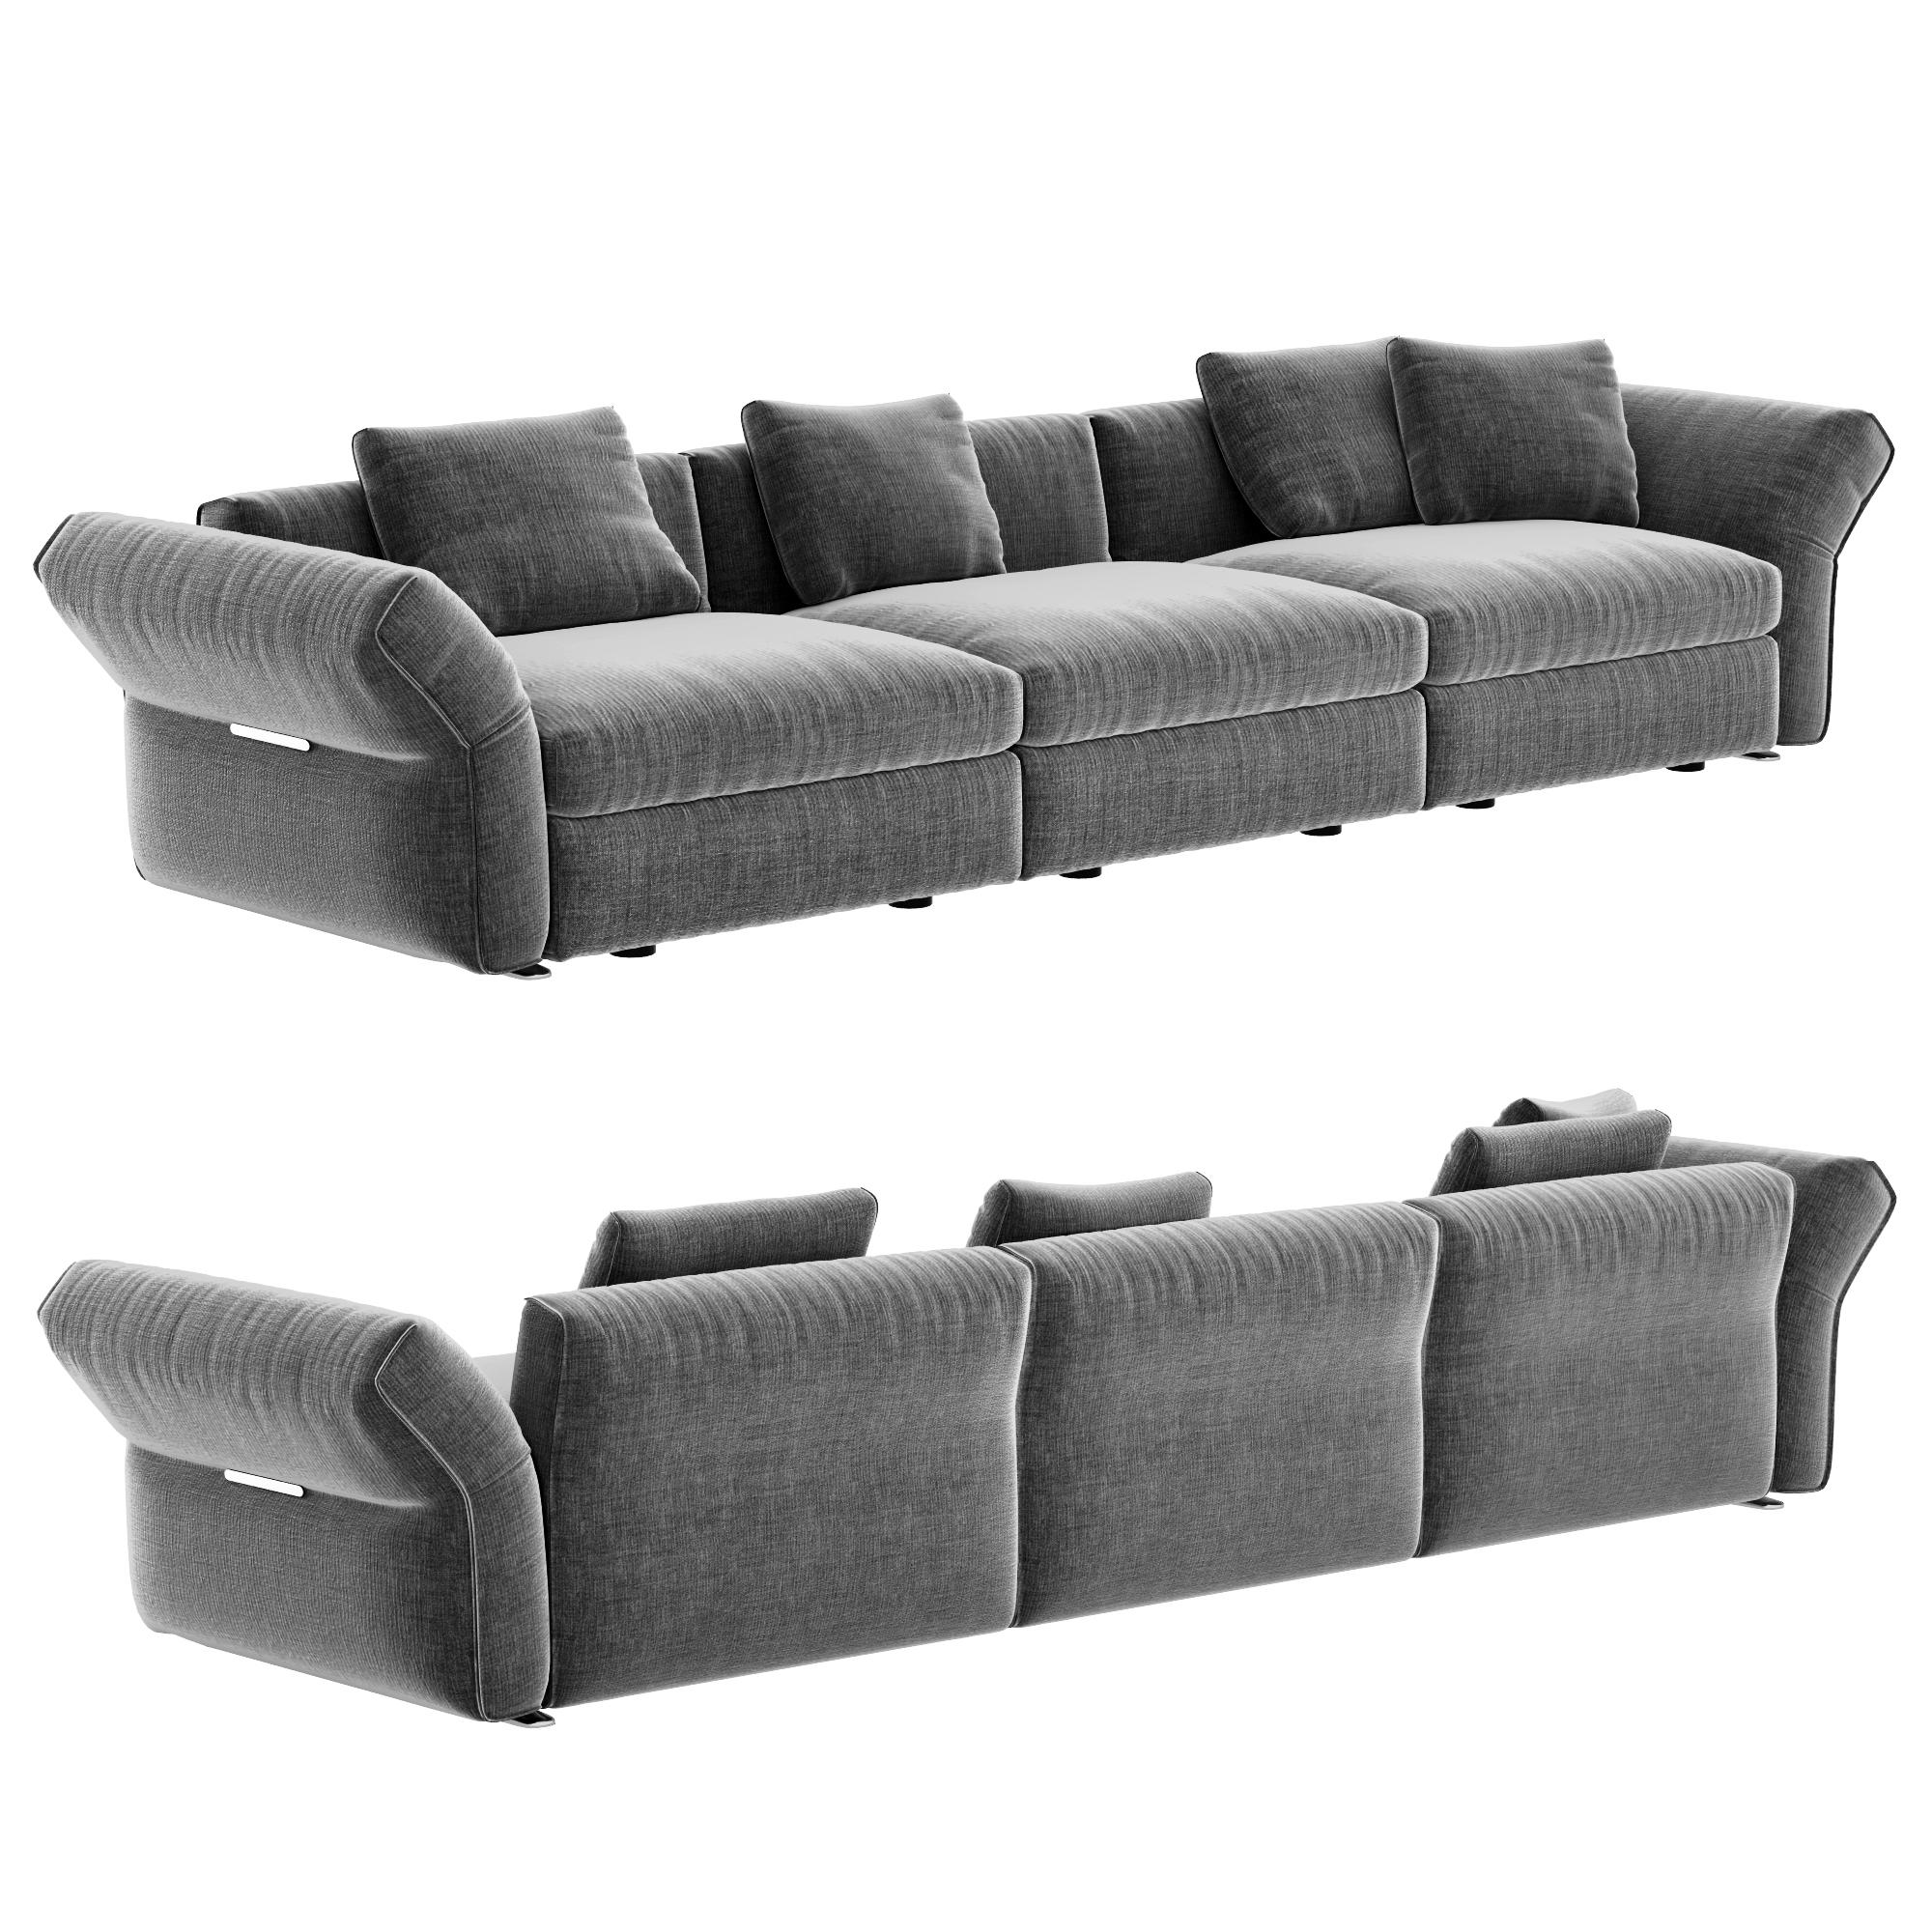 Full Size of Flexform Sofa Furniture Sale Uk Groundpiece Preis Bed Eden Sleeper Newbridge 3d Modell Turbosquid 1309382 Chippendale Mondo Erpo Hersteller Modernes Mit Led Sofa Flexform Sofa